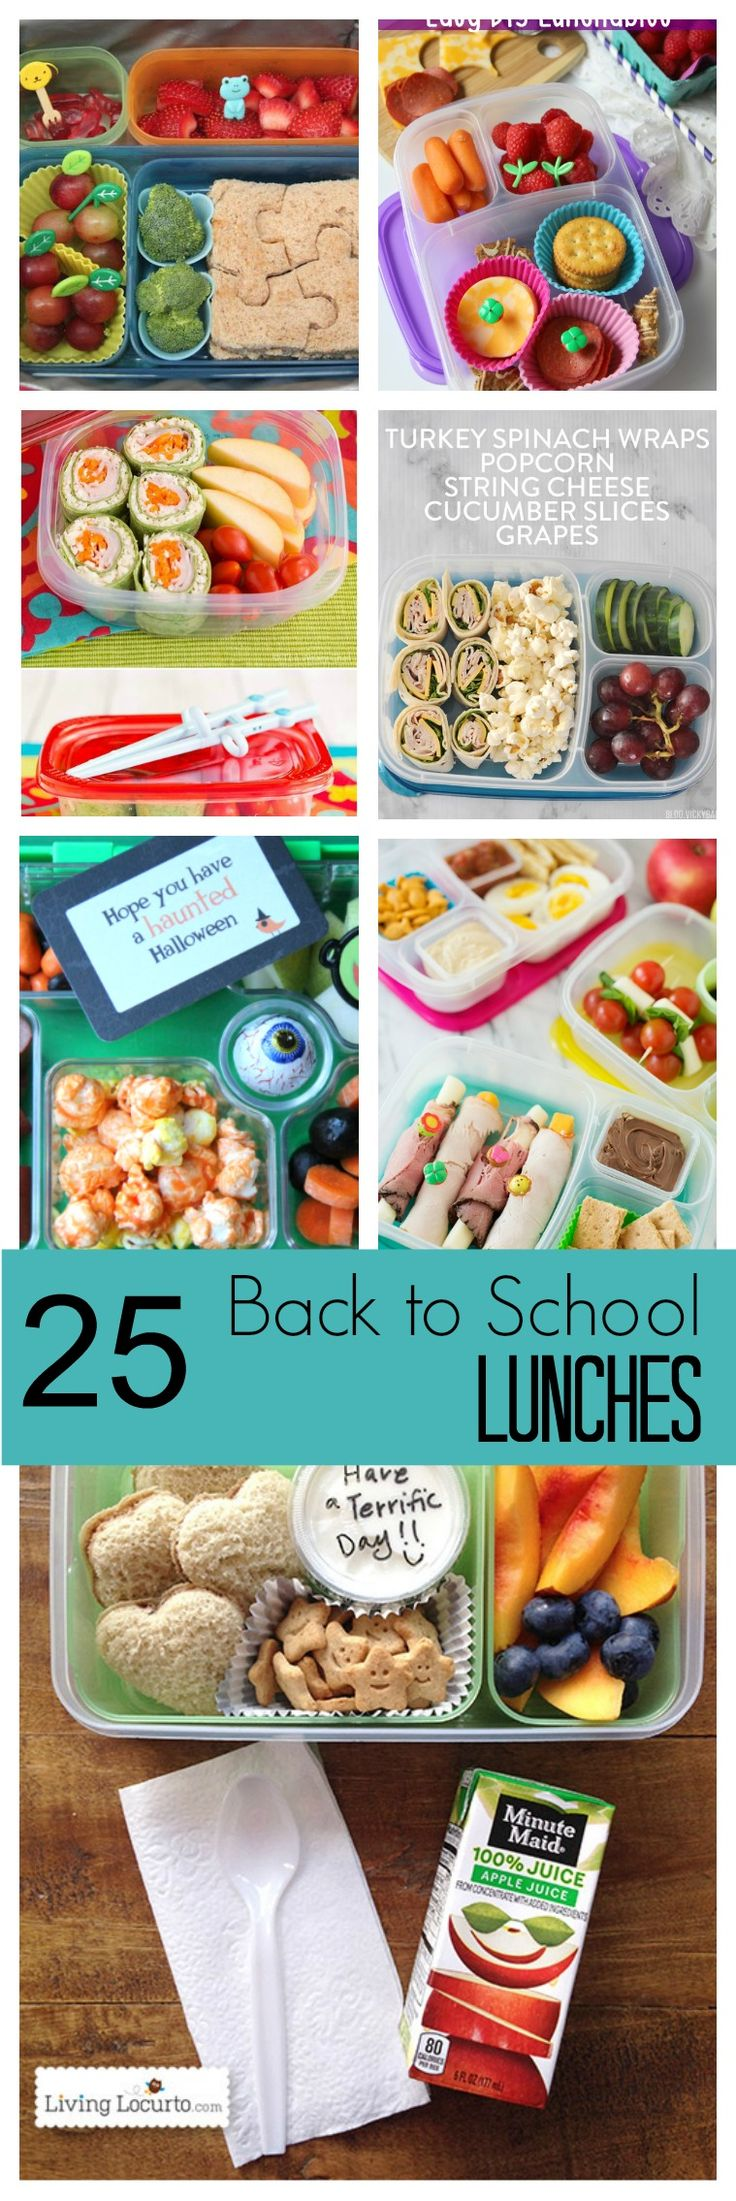 best 25 kindergarten lunch ideas on pinterest preschool lunch ideas kids school lunch ideas. Black Bedroom Furniture Sets. Home Design Ideas